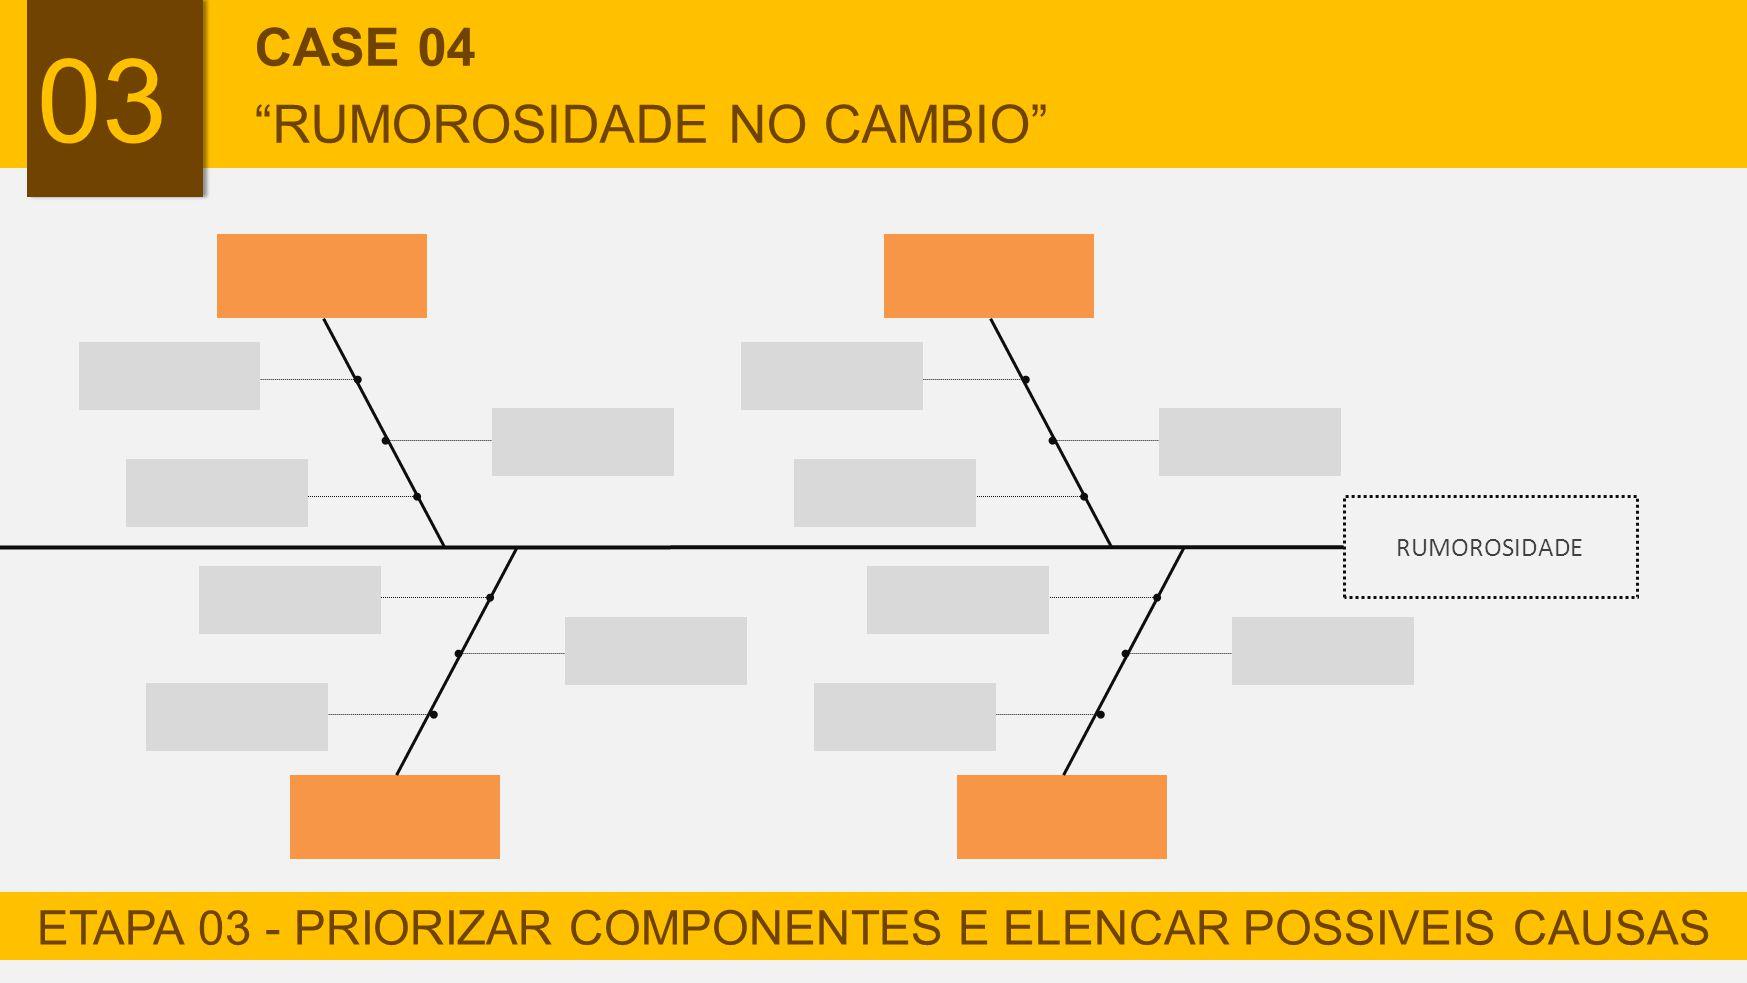 "ETAPA 03 - PRIORIZAR COMPONENTES E ELENCAR POSSIVEIS CAUSAS RUMOROSIDADE CASE 04 ""RUMOROSIDADE NO CAMBIO"""